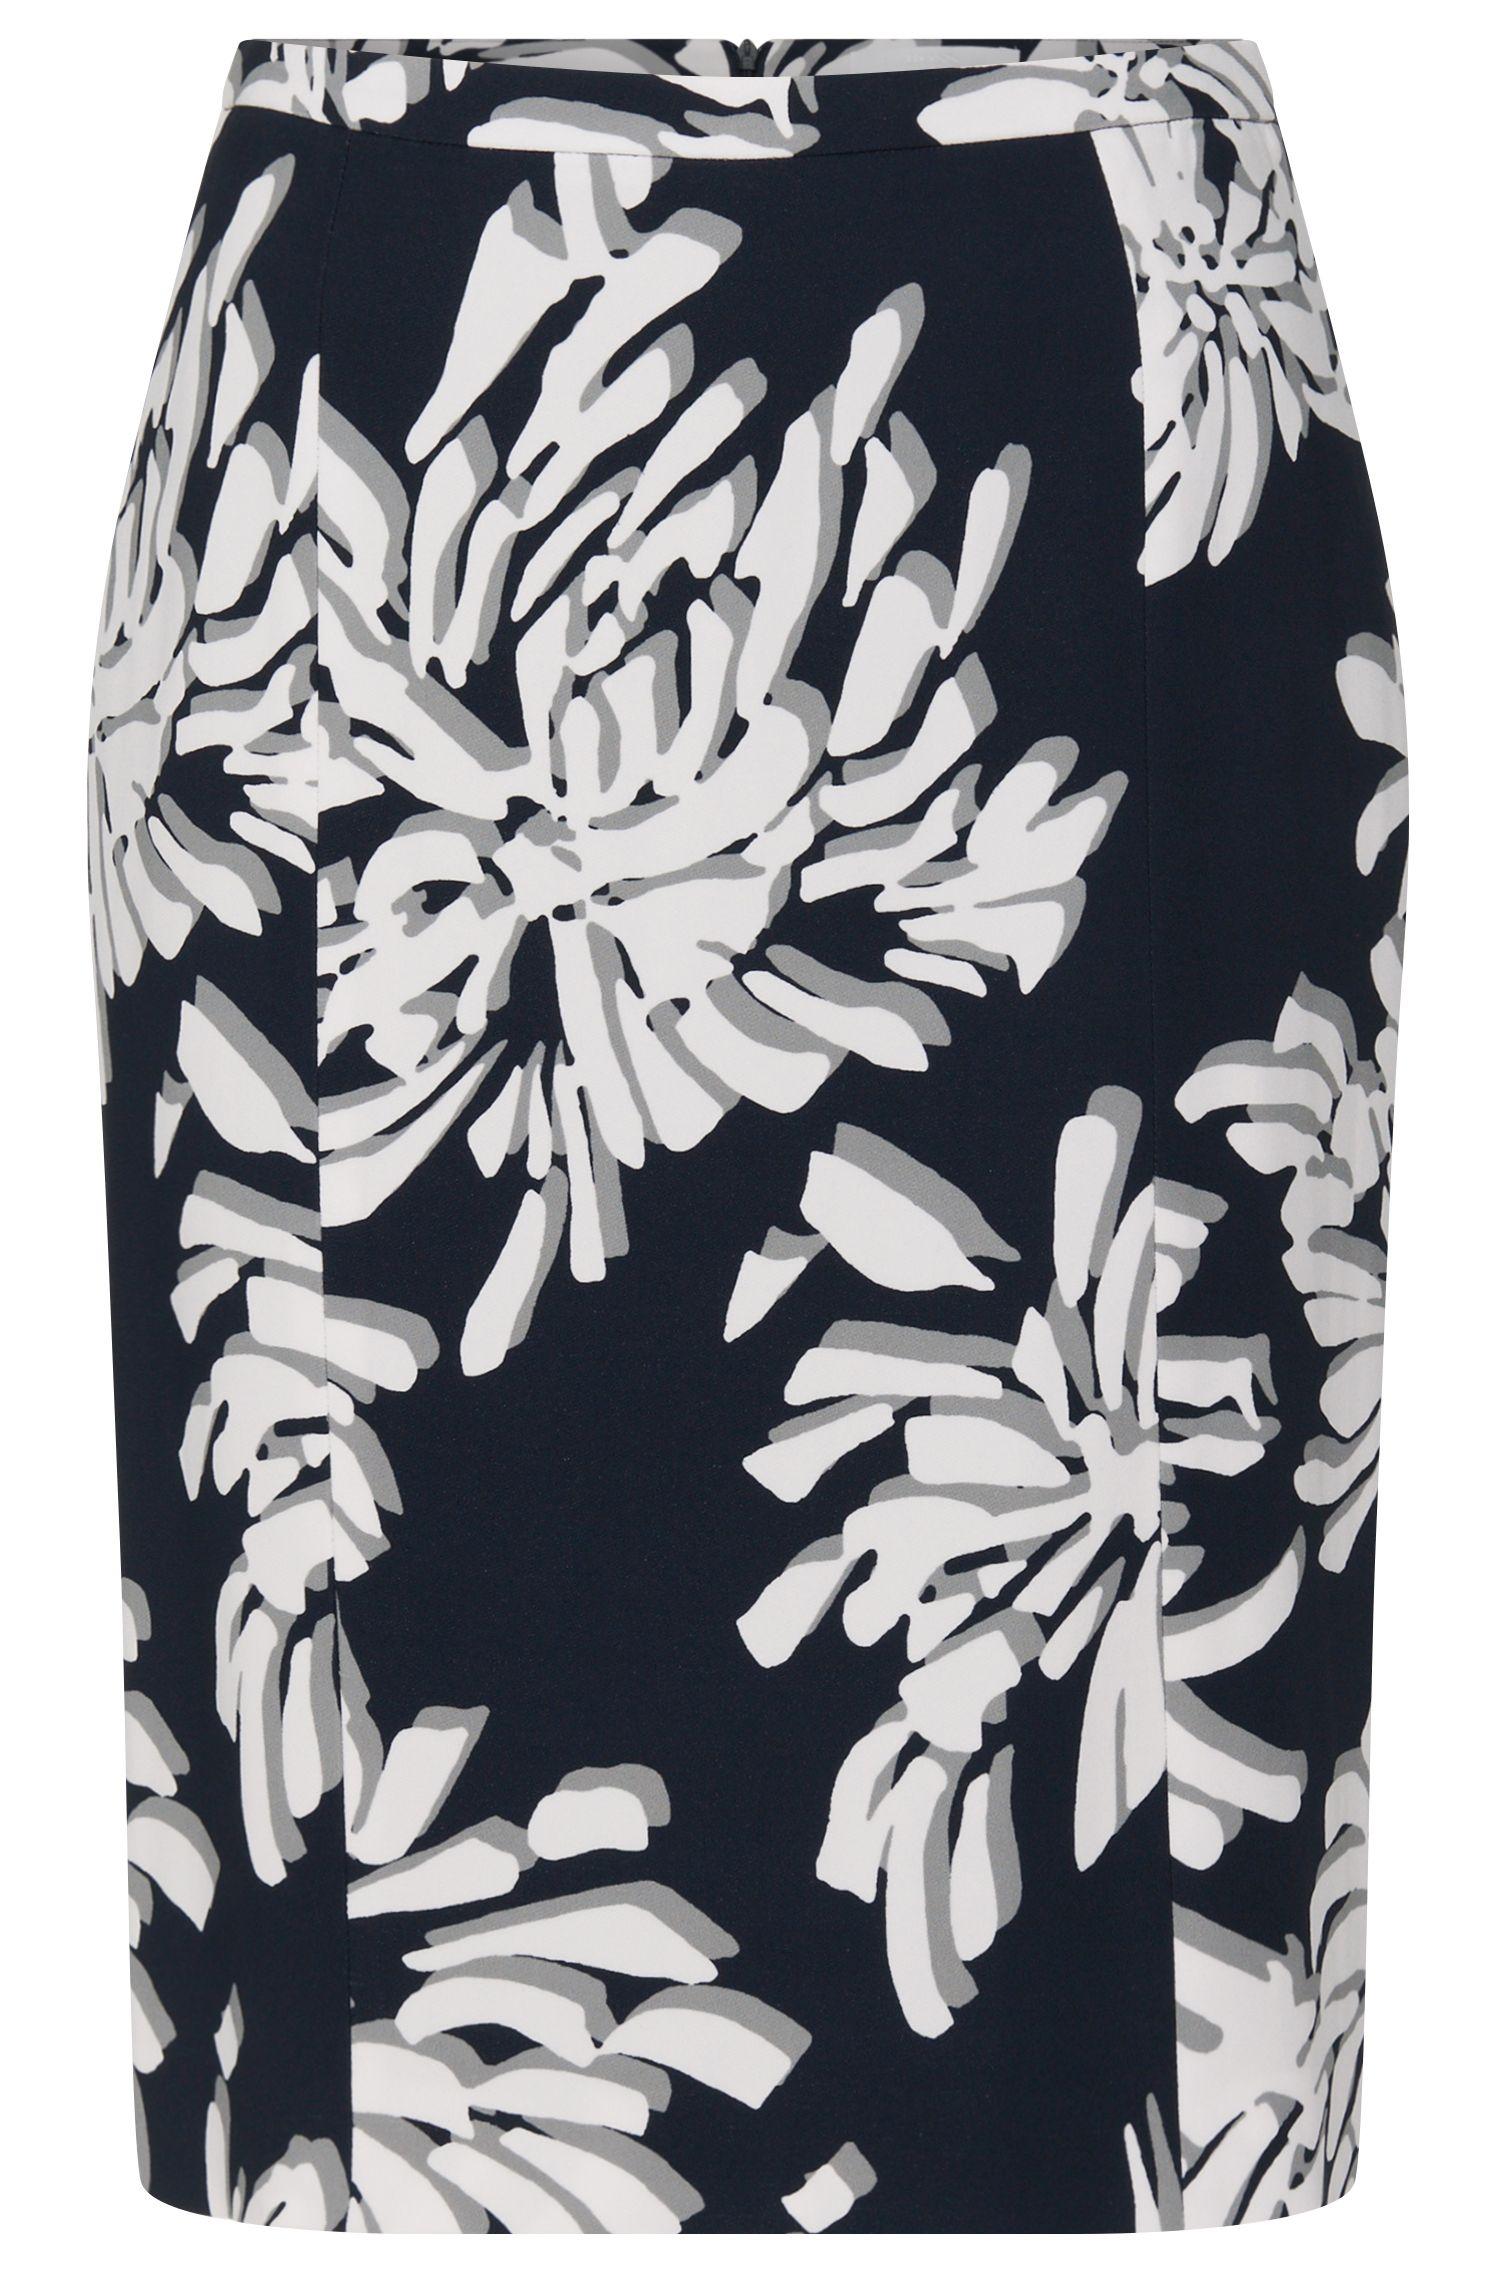 'Veala' | Stretch Floral Skirt